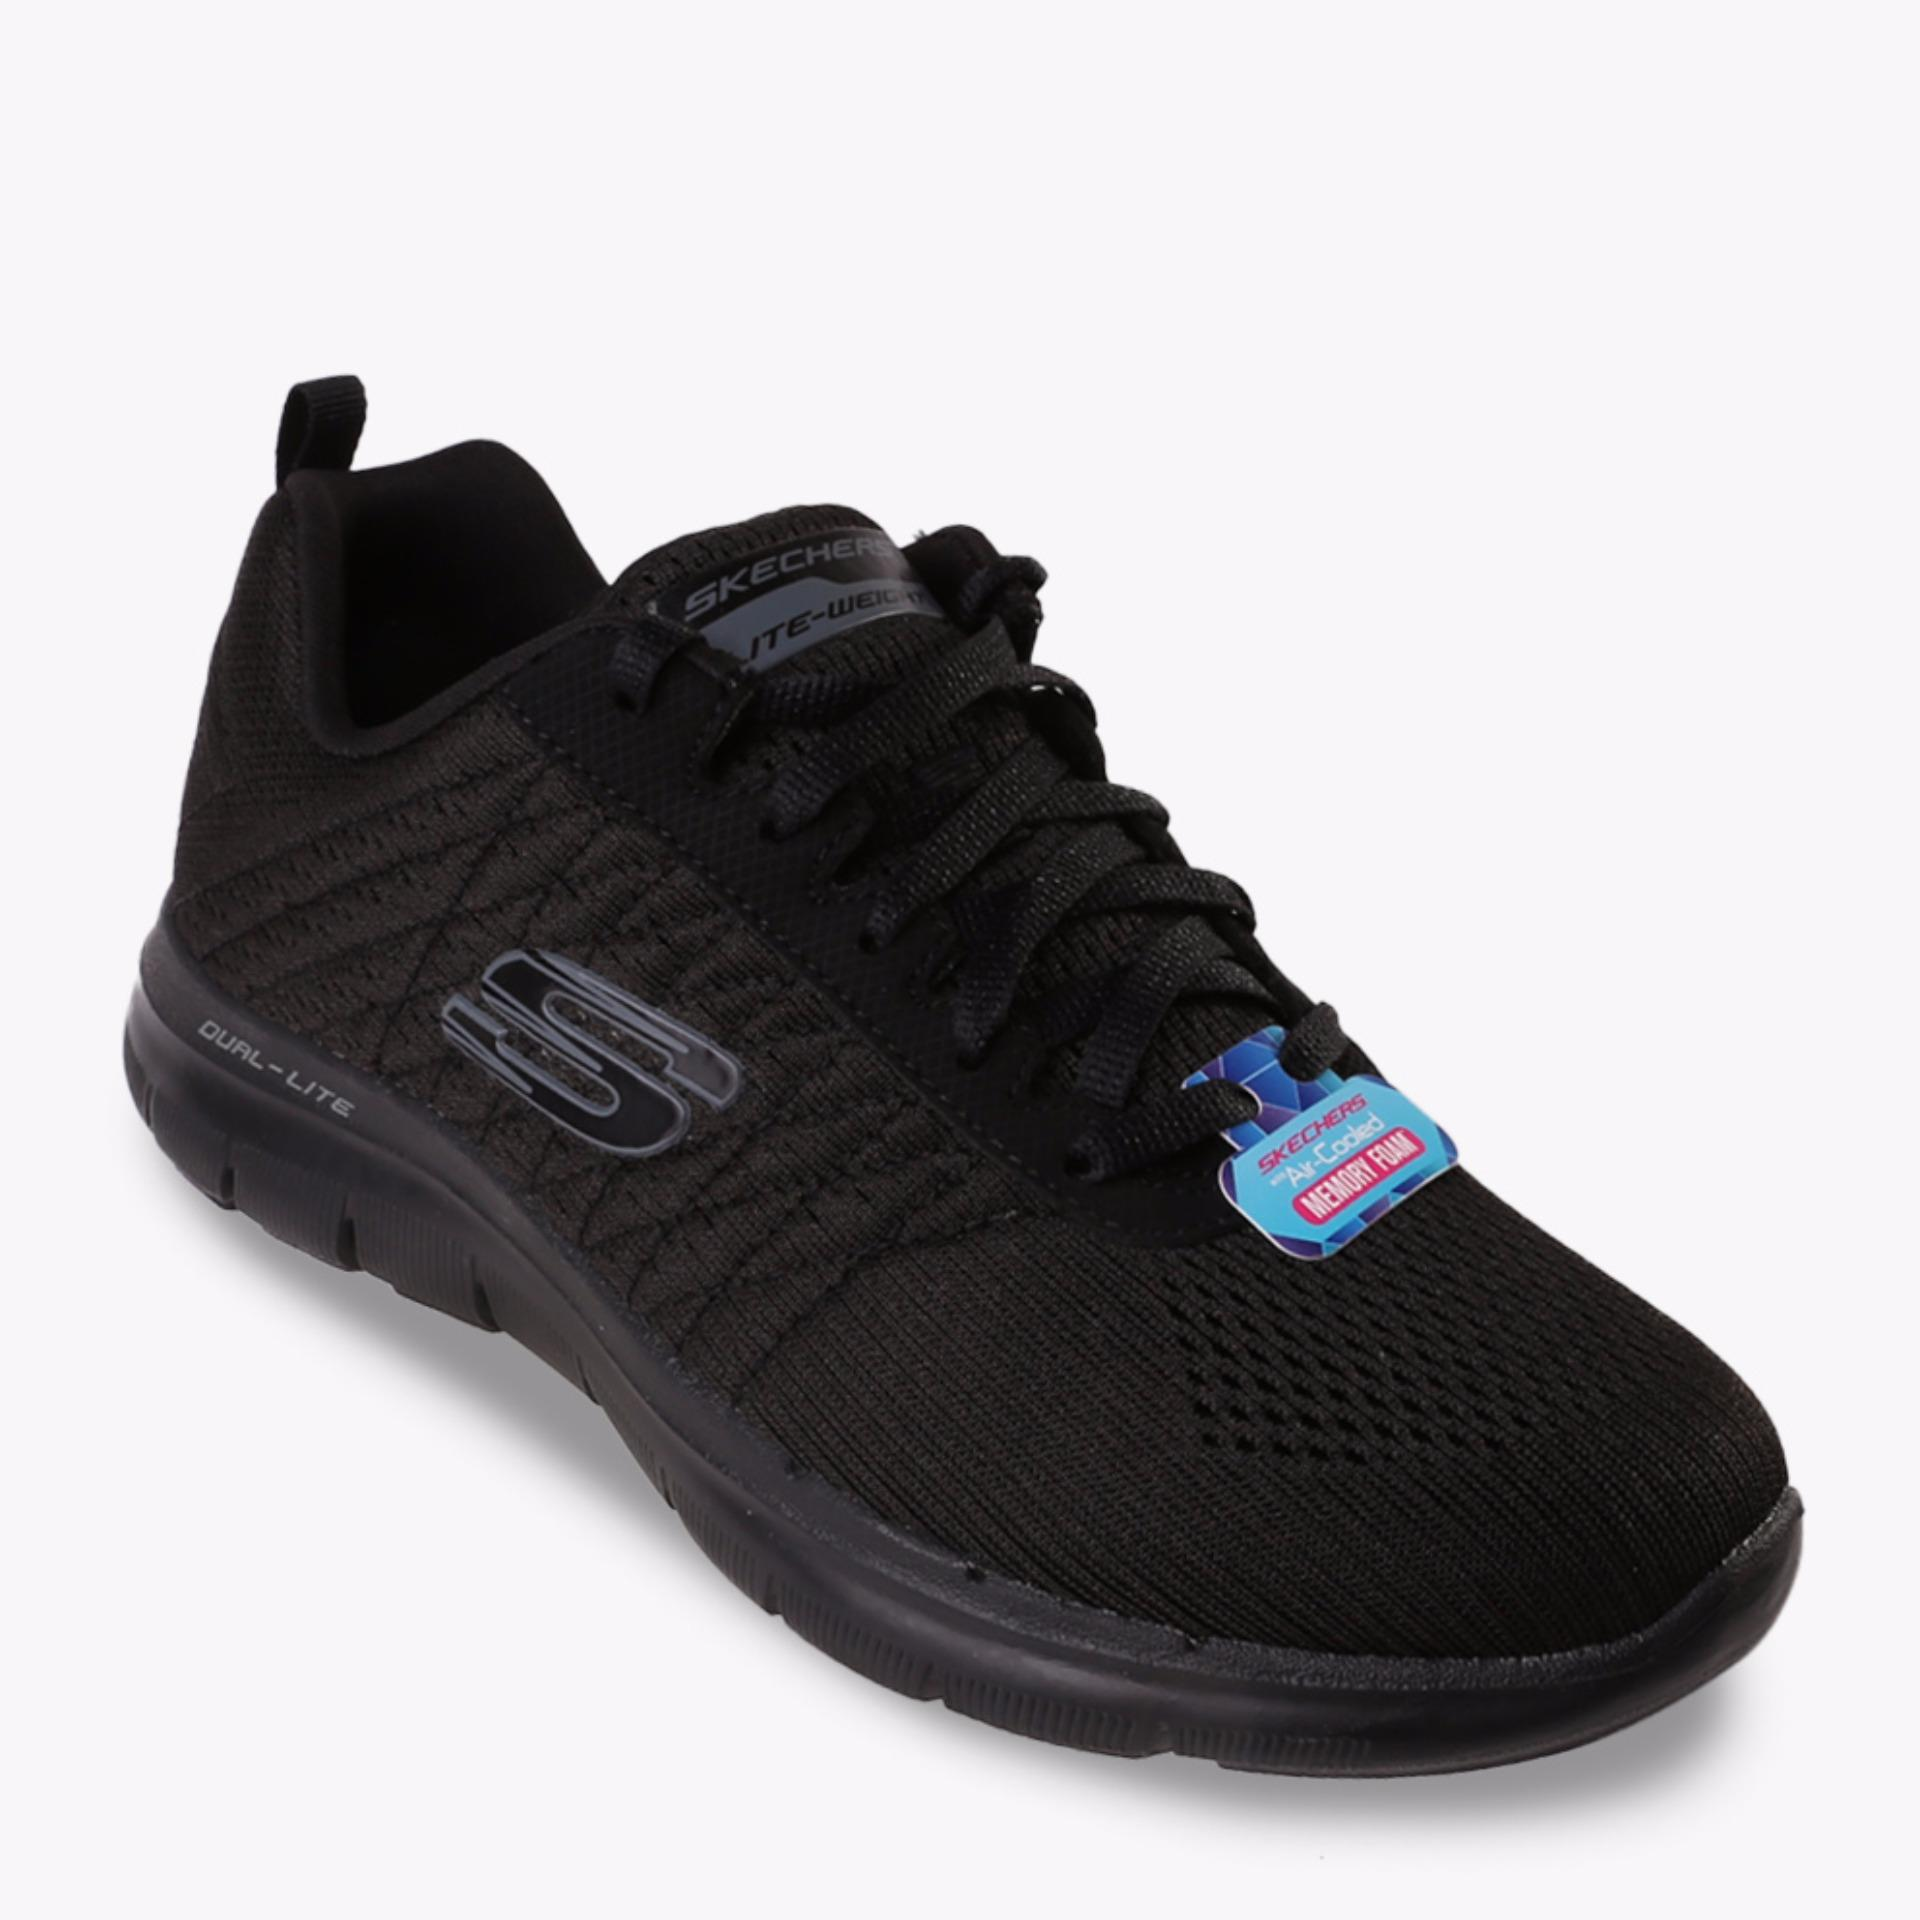 Beli Skechers Flex Appeal 2 Break Free Women S Running Shoes Hitam Online Murah